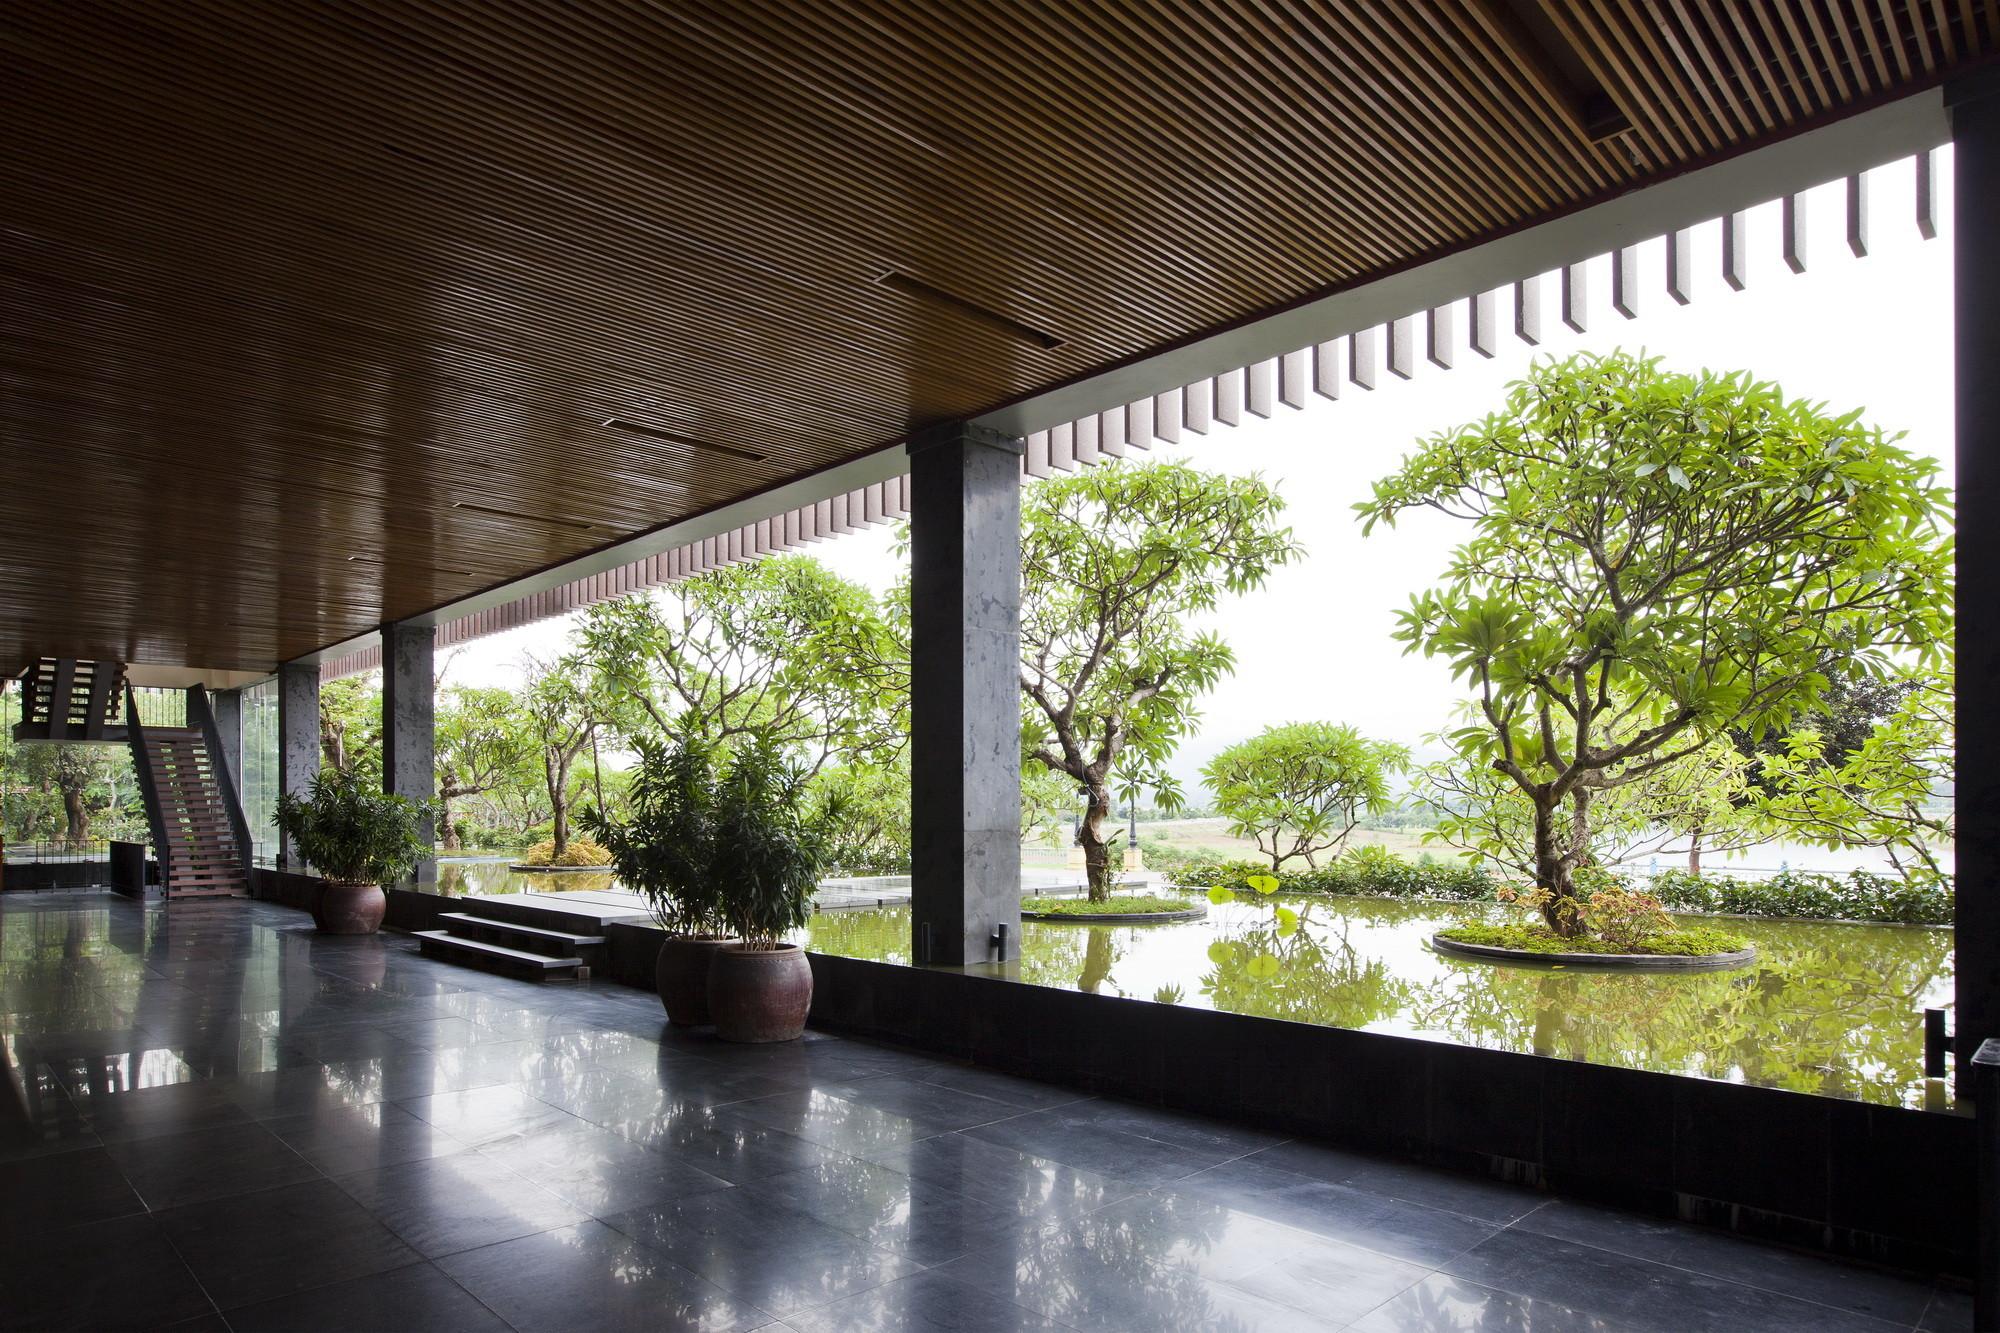 Gallery of kontum indochine wedding hall vtn architects 3 for Architecture japonaise